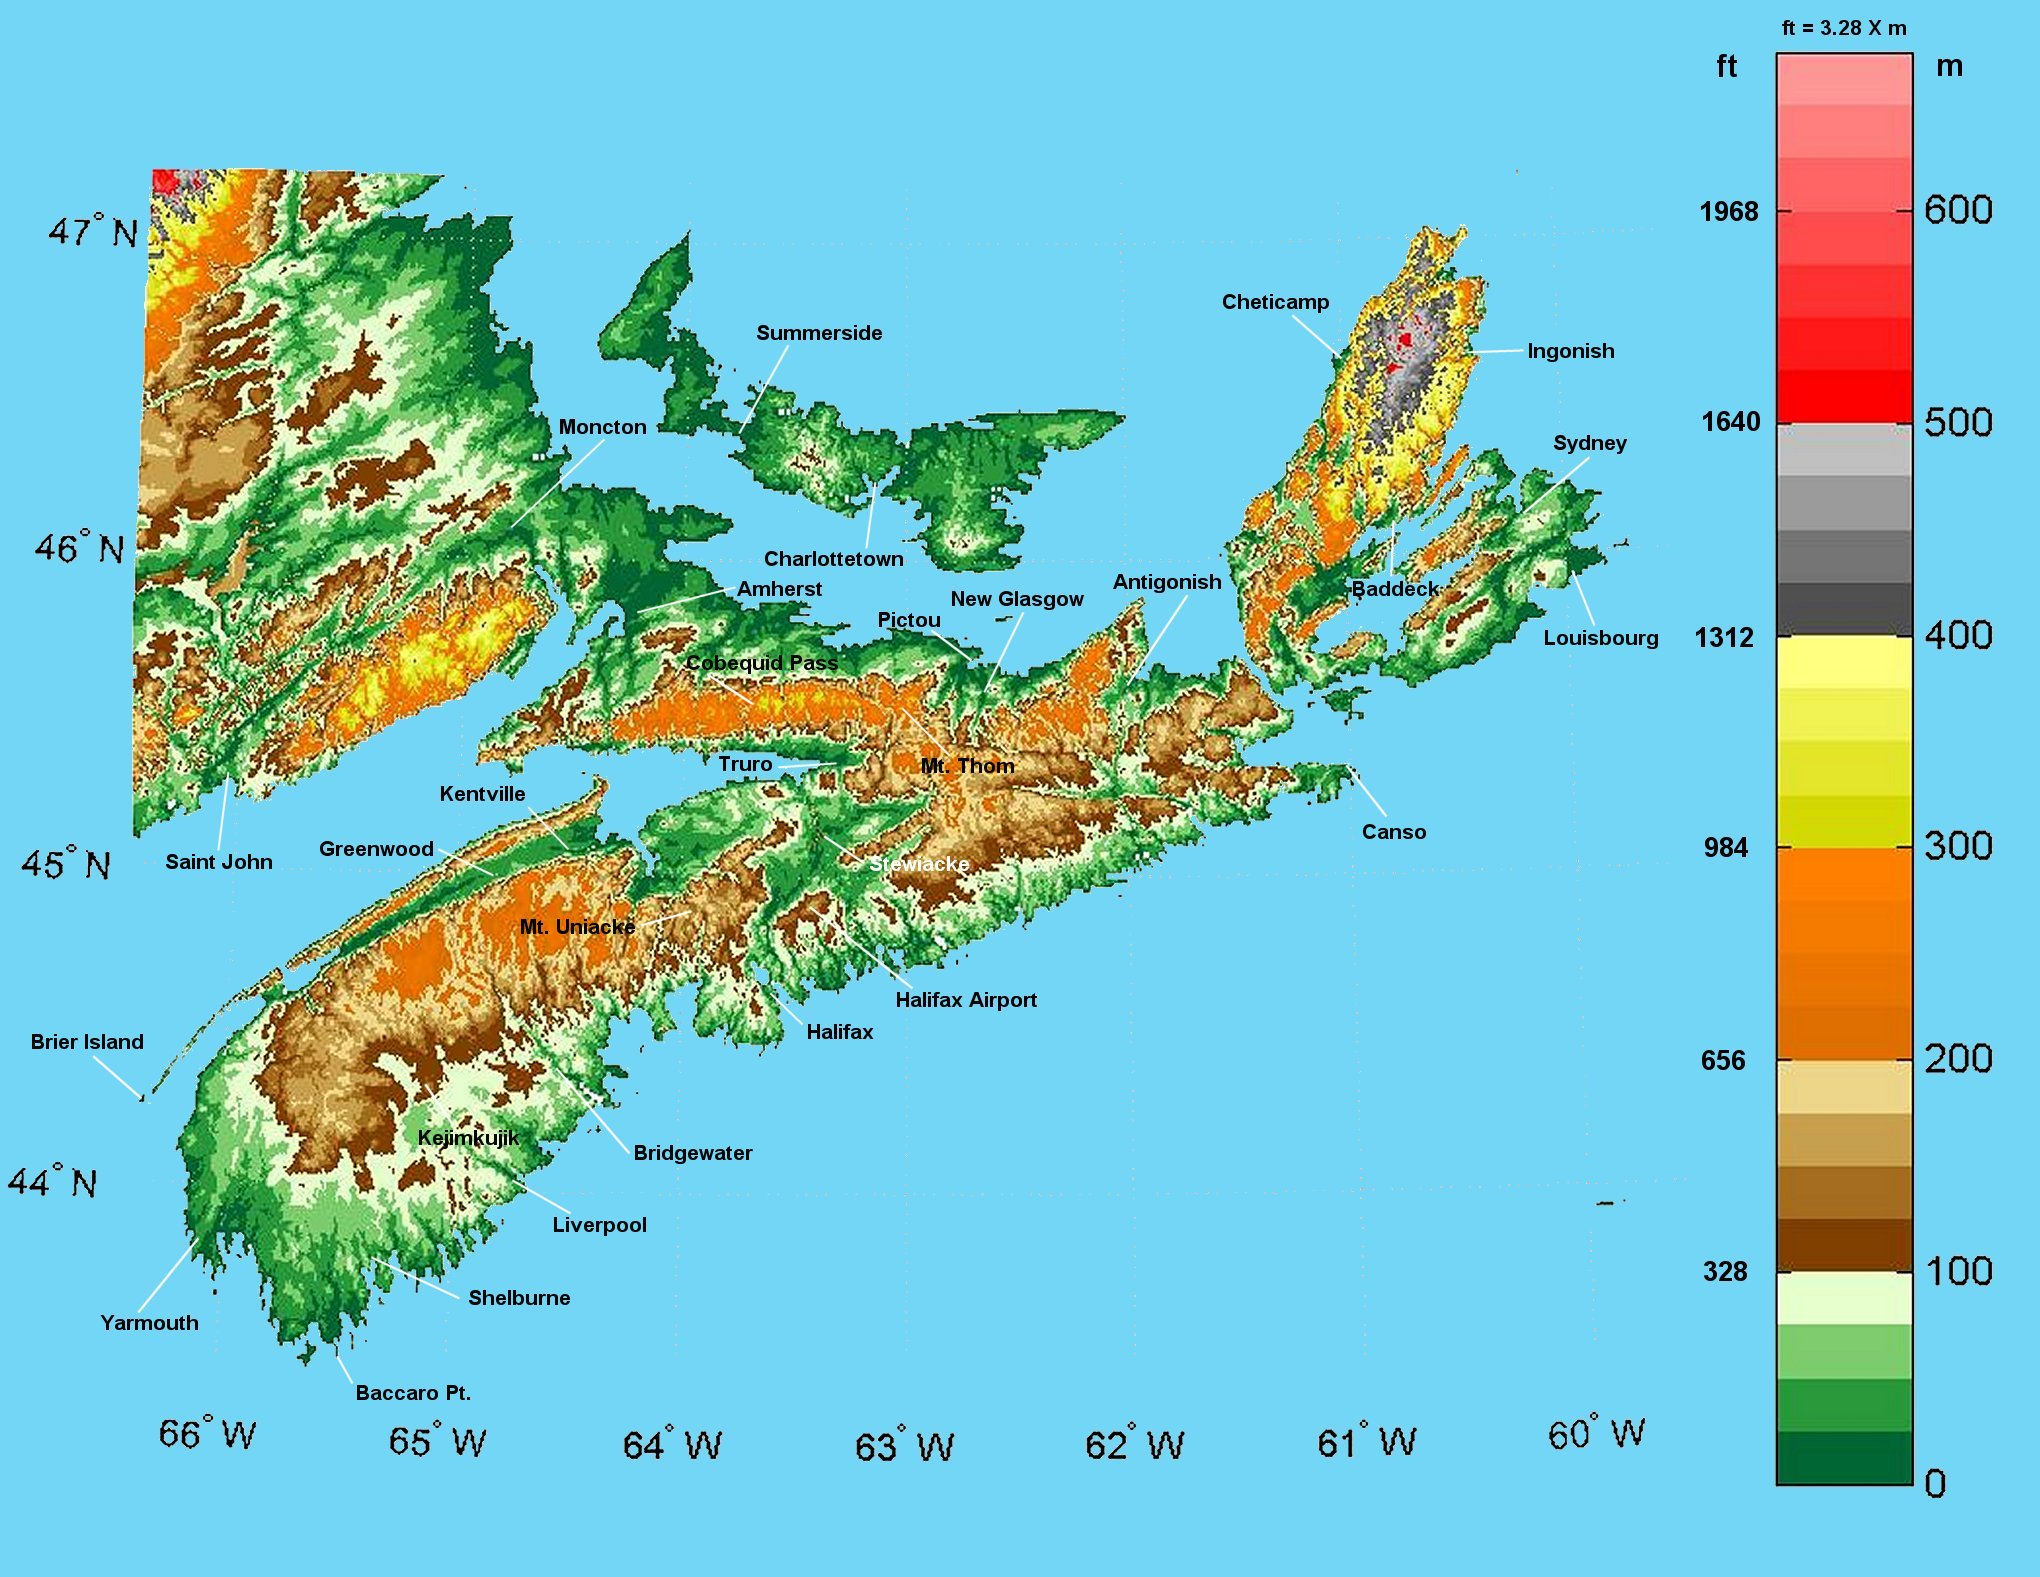 Nova Scotia Elevation Map Nova Scotia Mappery - Nova scotia map